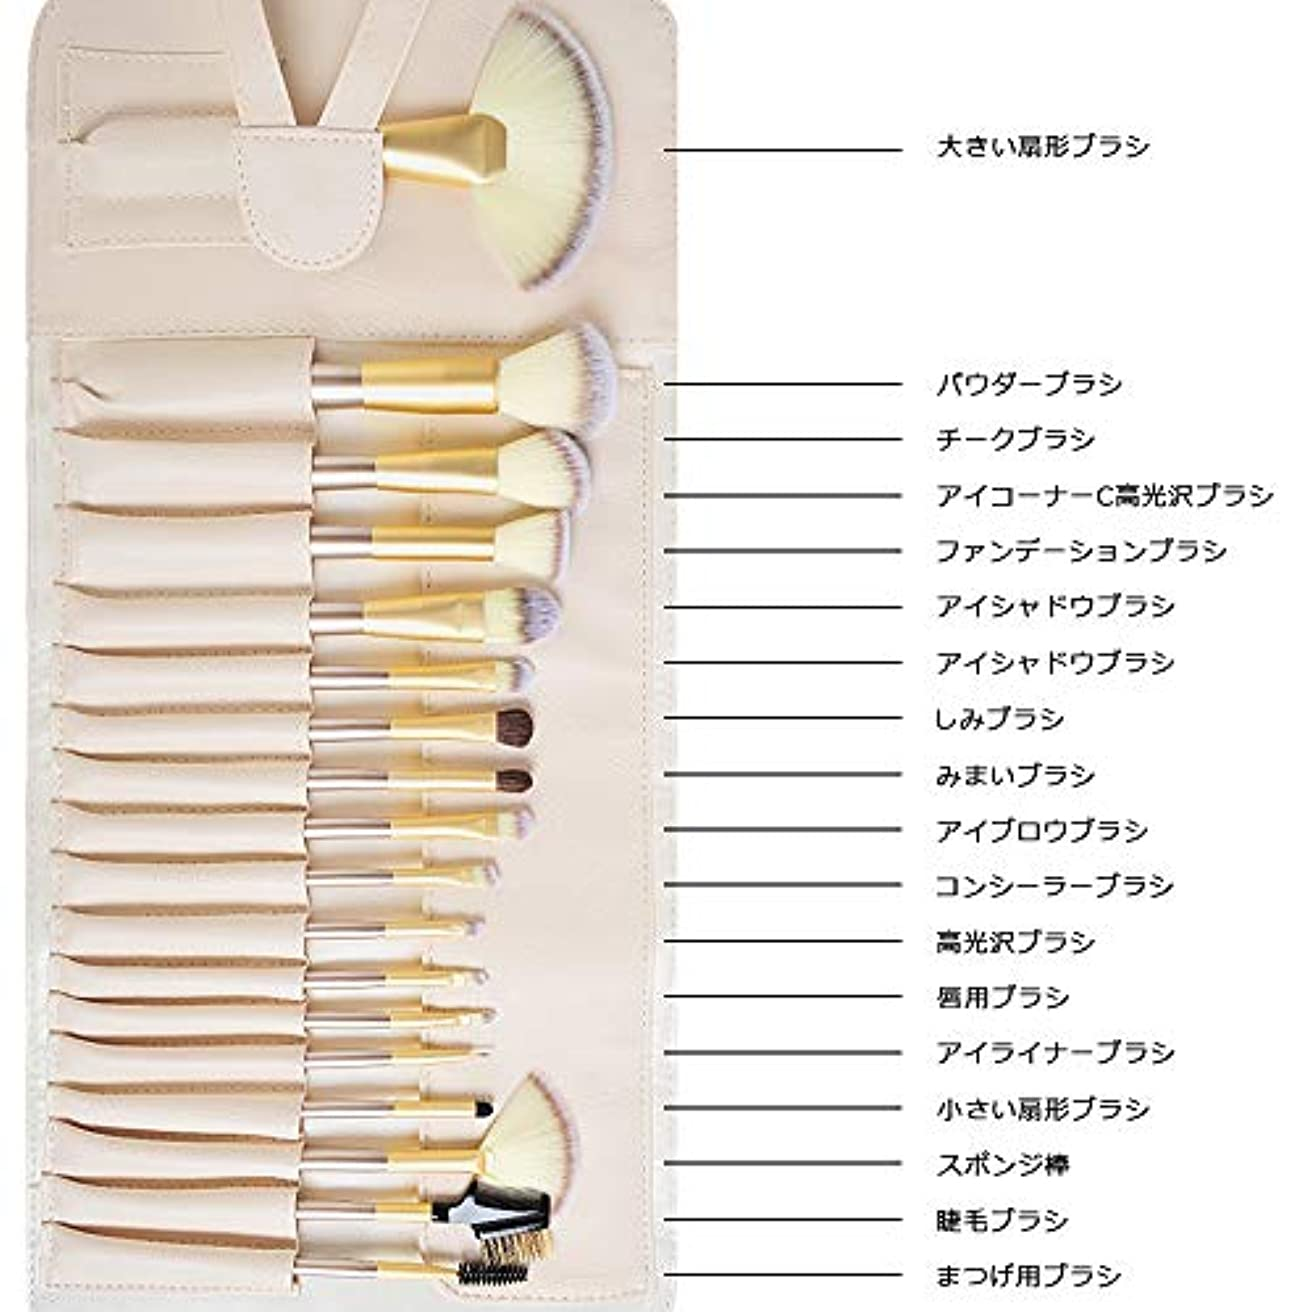 Acavado メイクブラシ 18本セット 人気化粧筆 超柔らかい 高品質PUレザー化粧ポーチ付き メイクデビュー Acavado